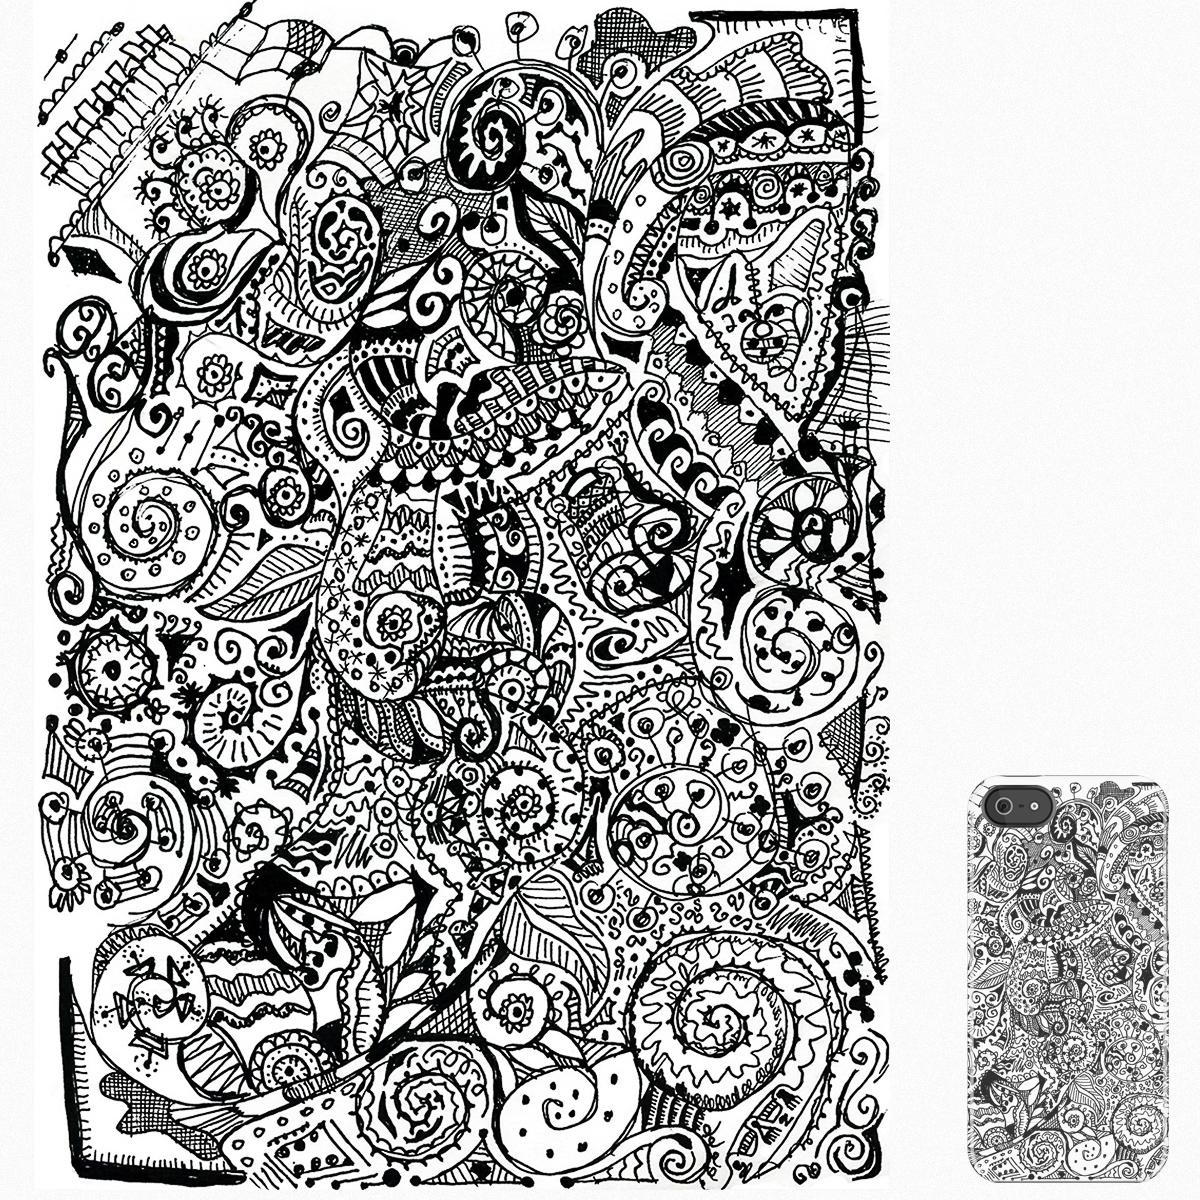 Tangle by VenturousMind on Threadless